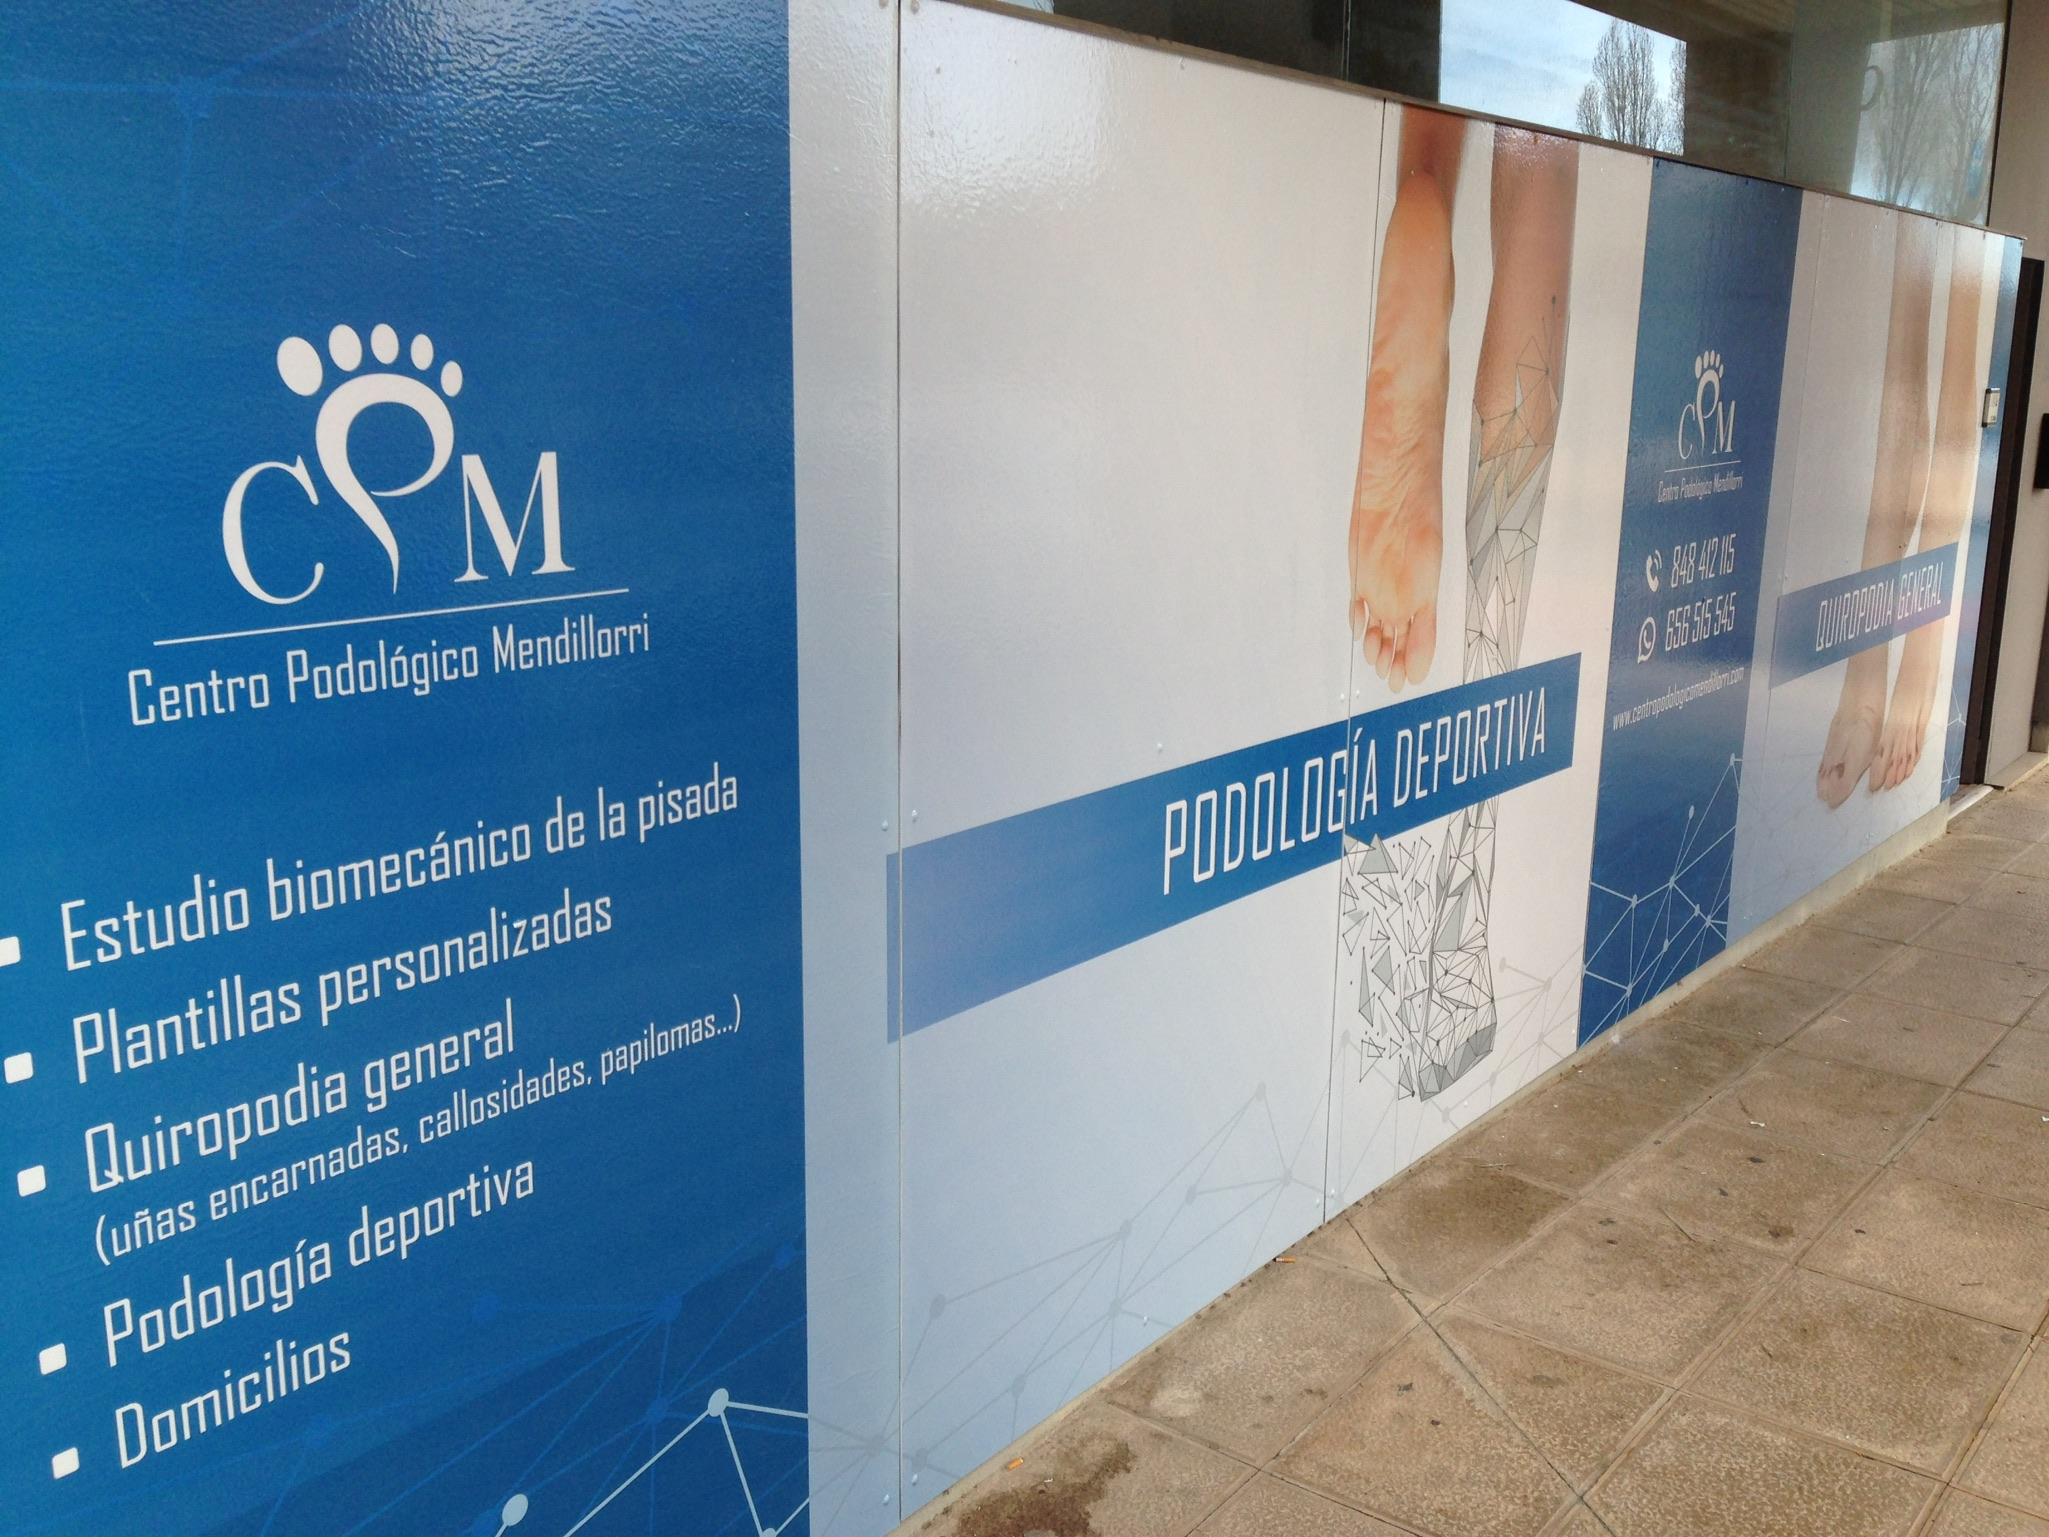 Apertura Centro Podológico Mendillorri Centro Podológico